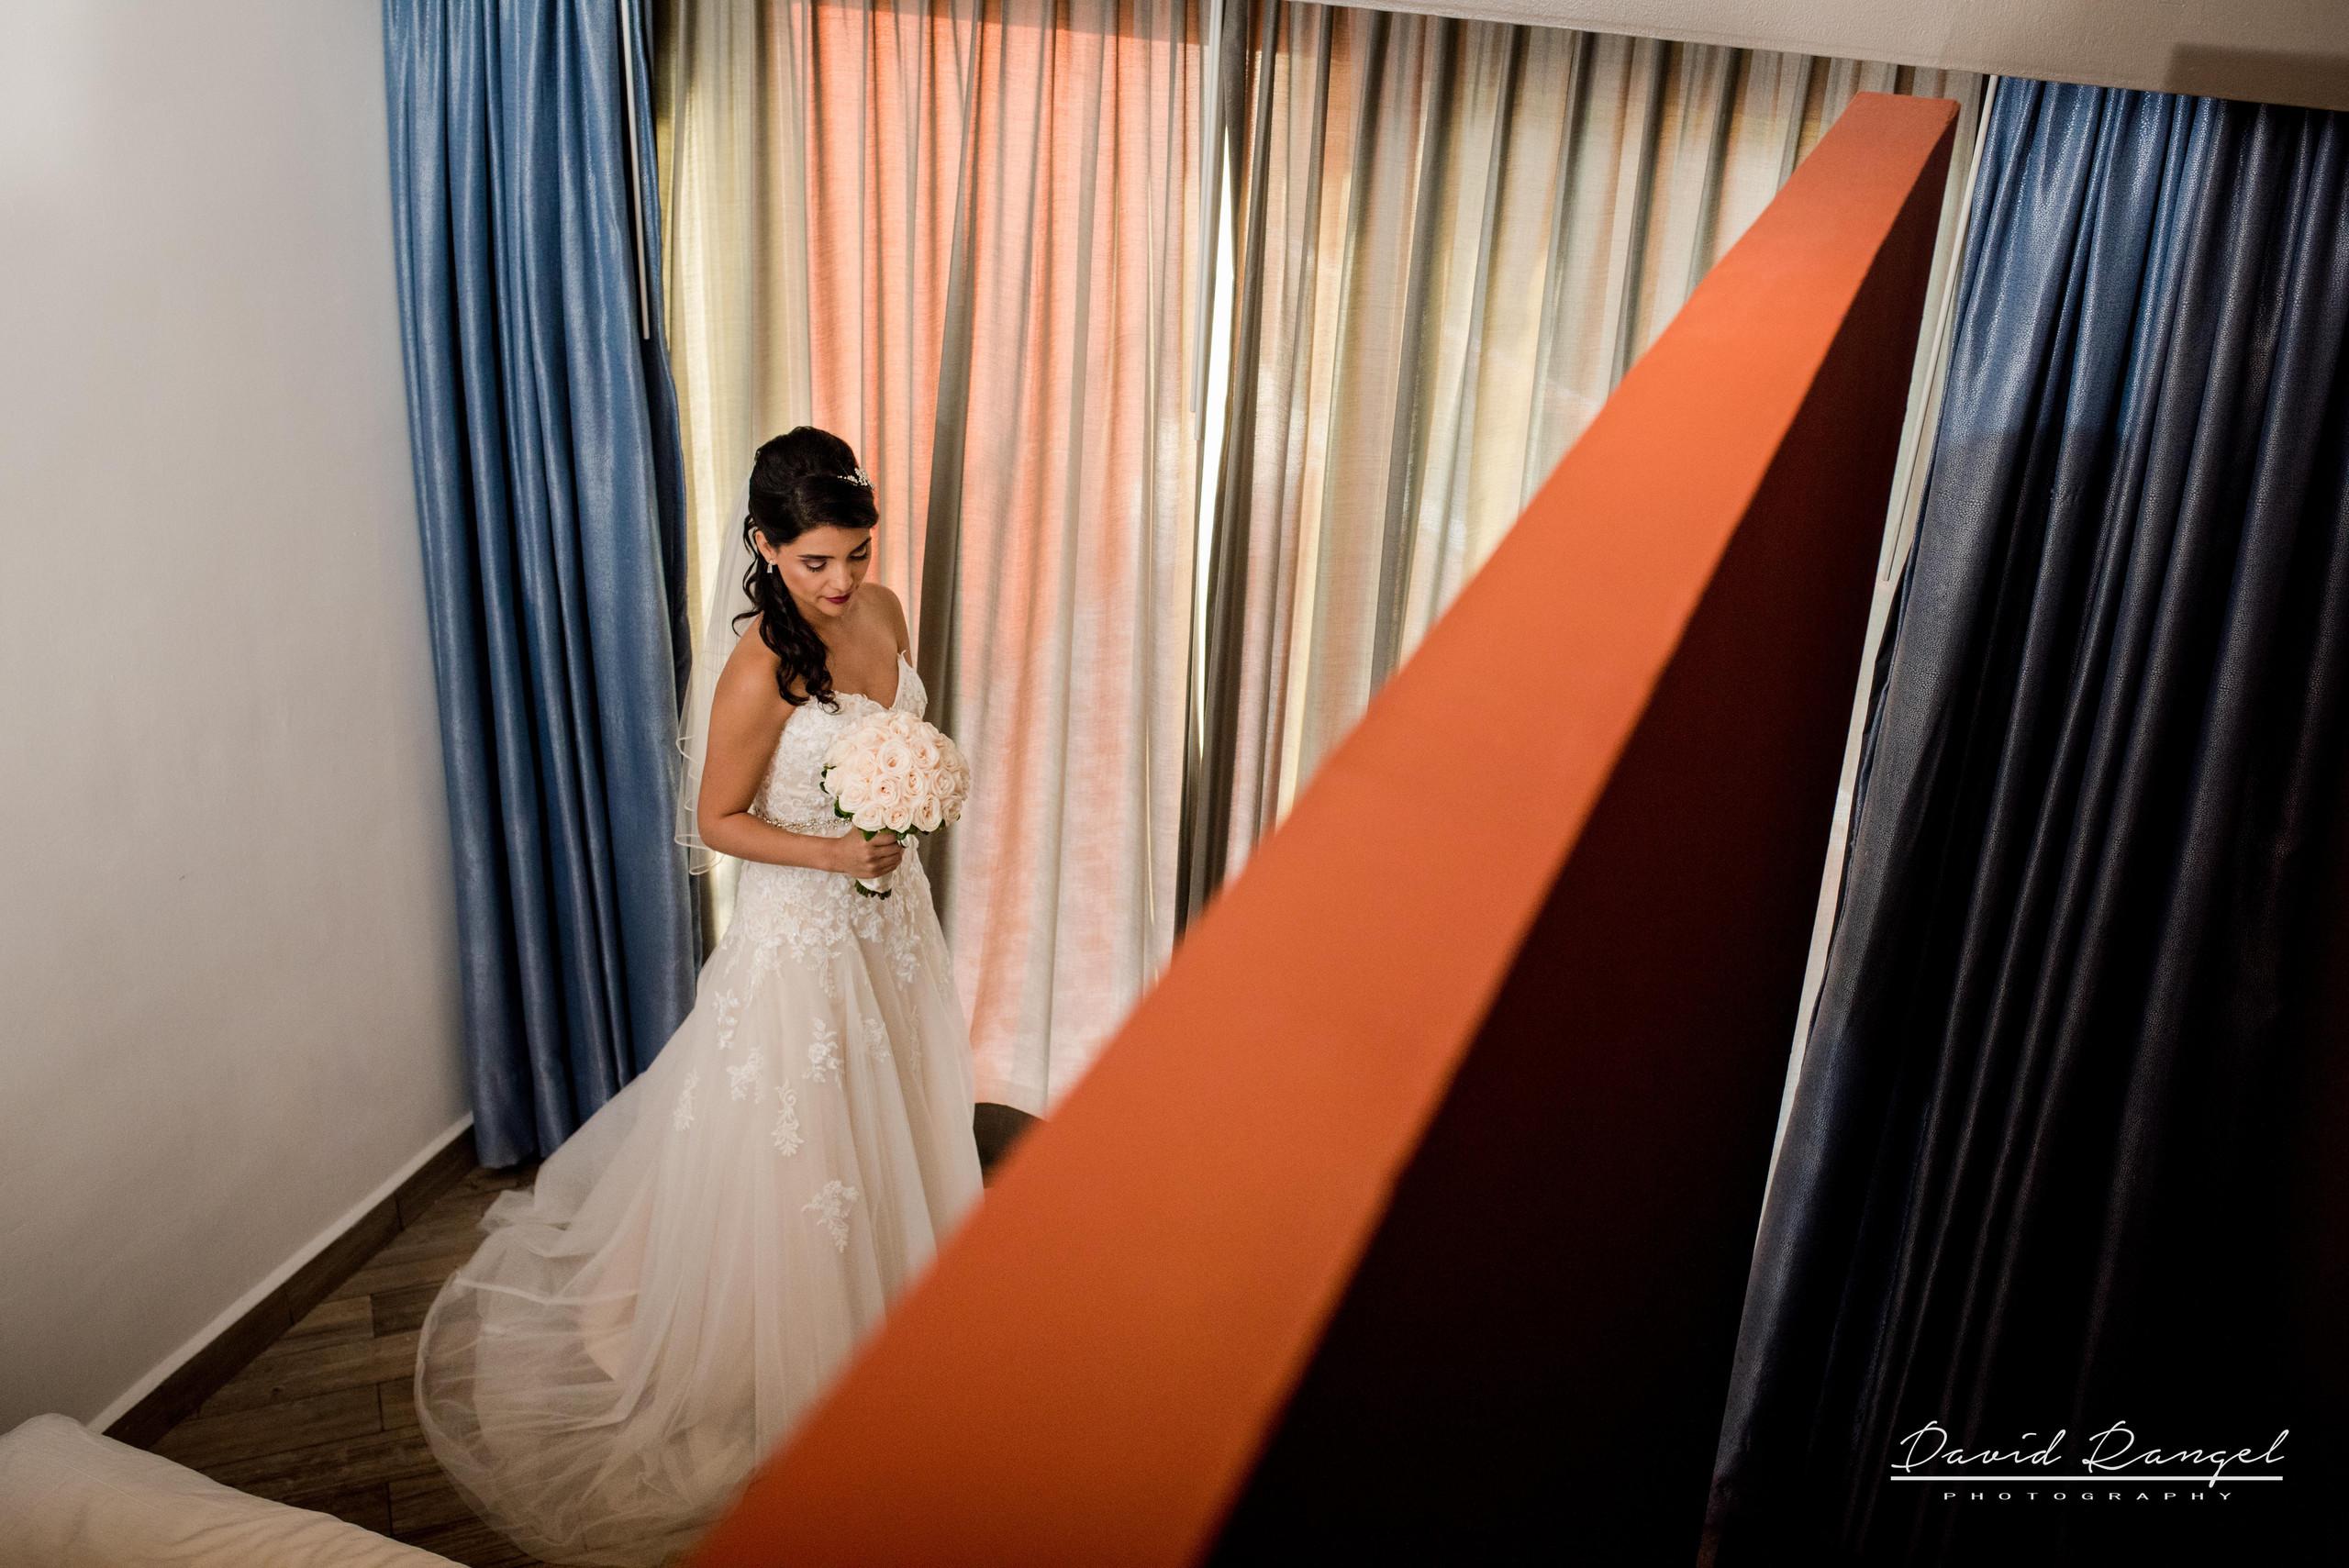 bride+geometri+destination+wedding+photo+picture